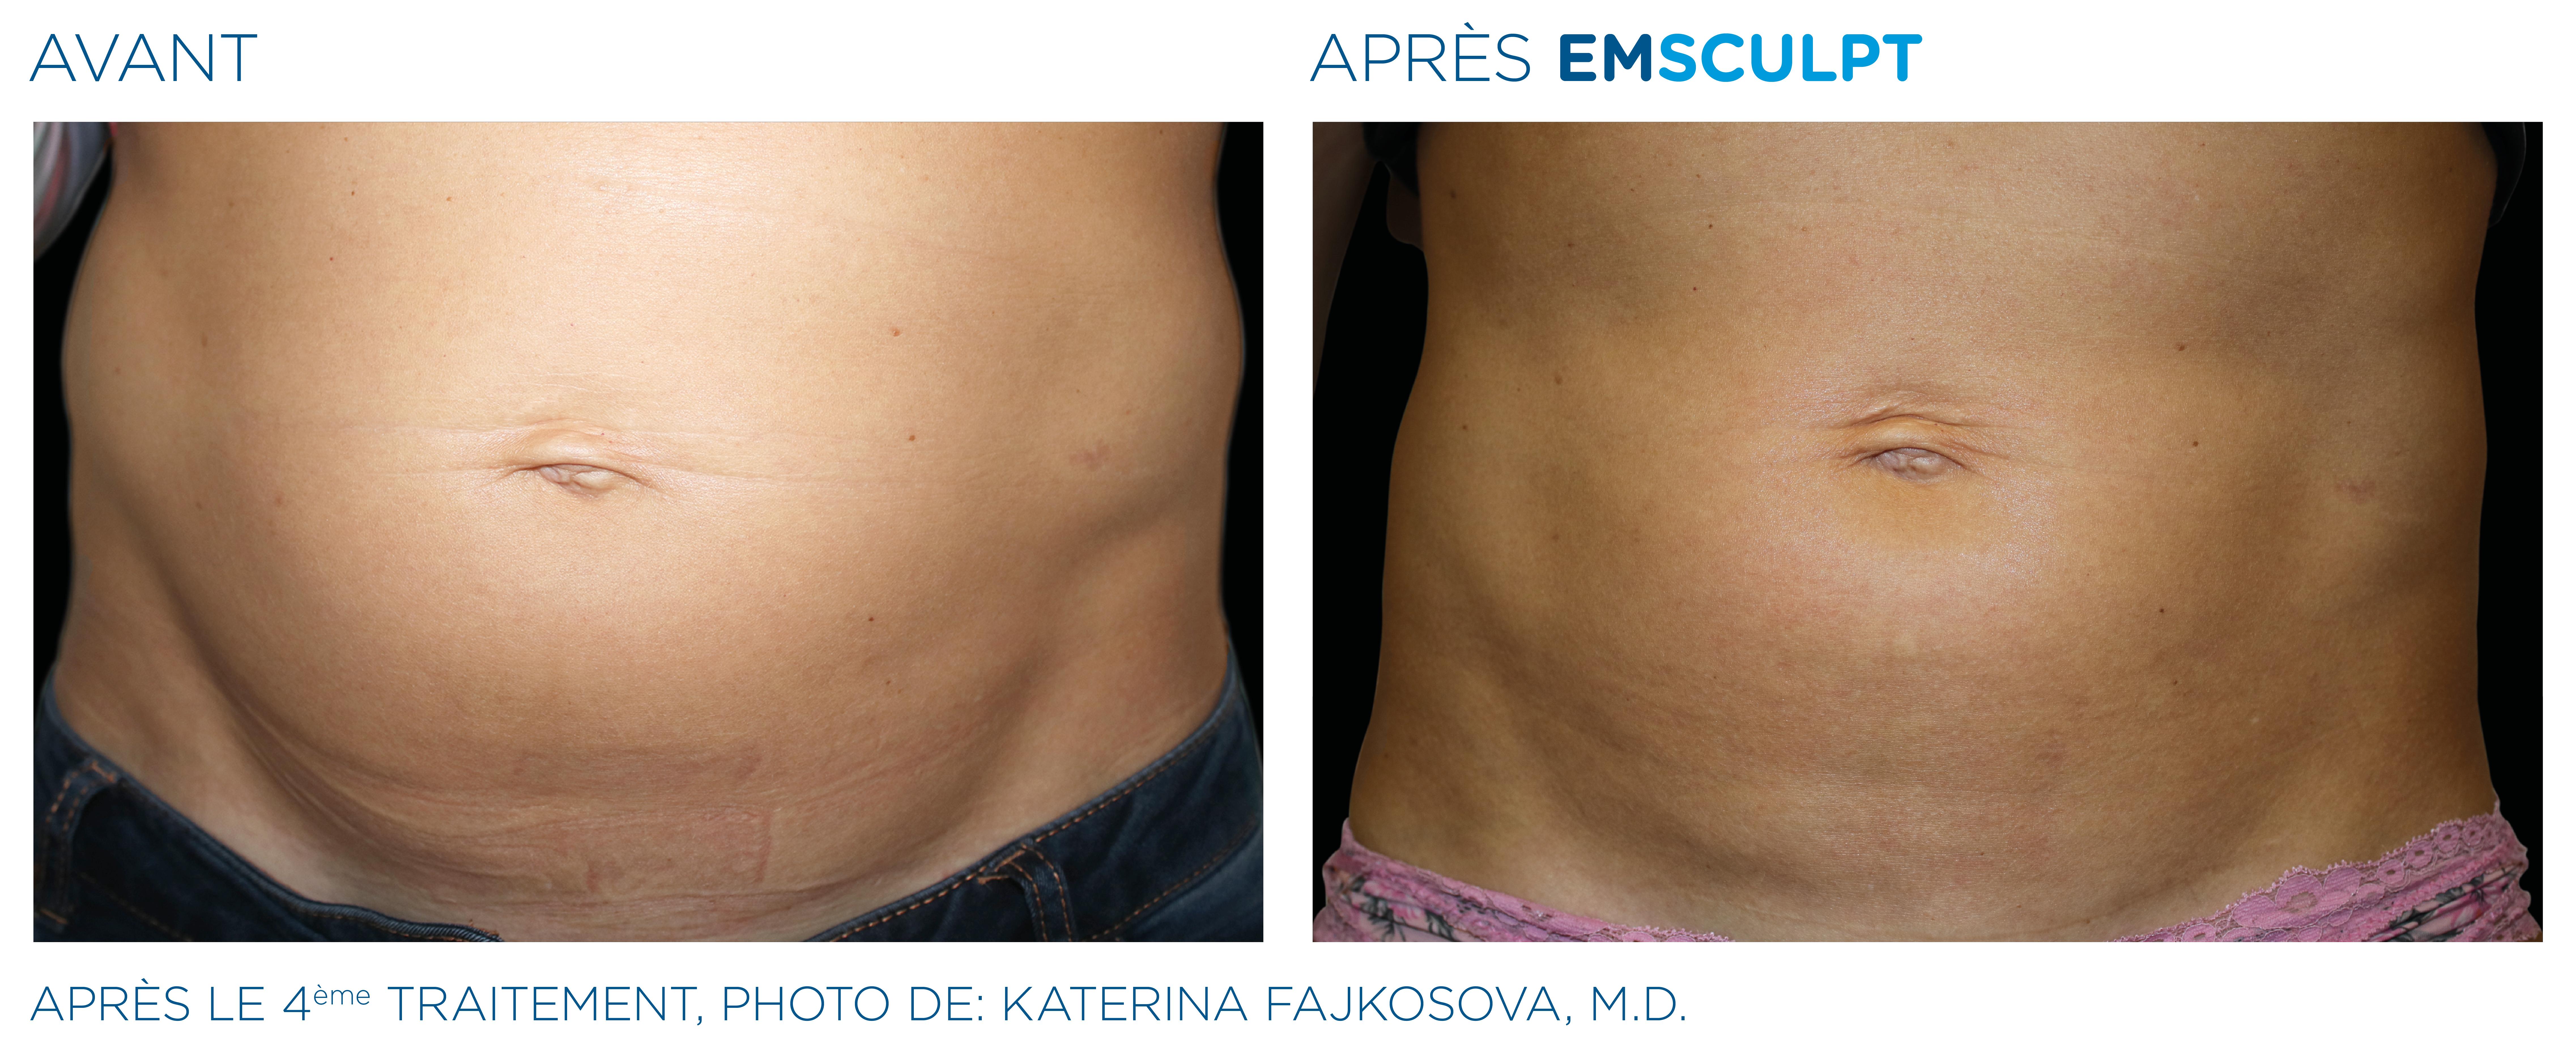 Emsculpt_PIC_Ba-card-female-abdomen-008_FR100